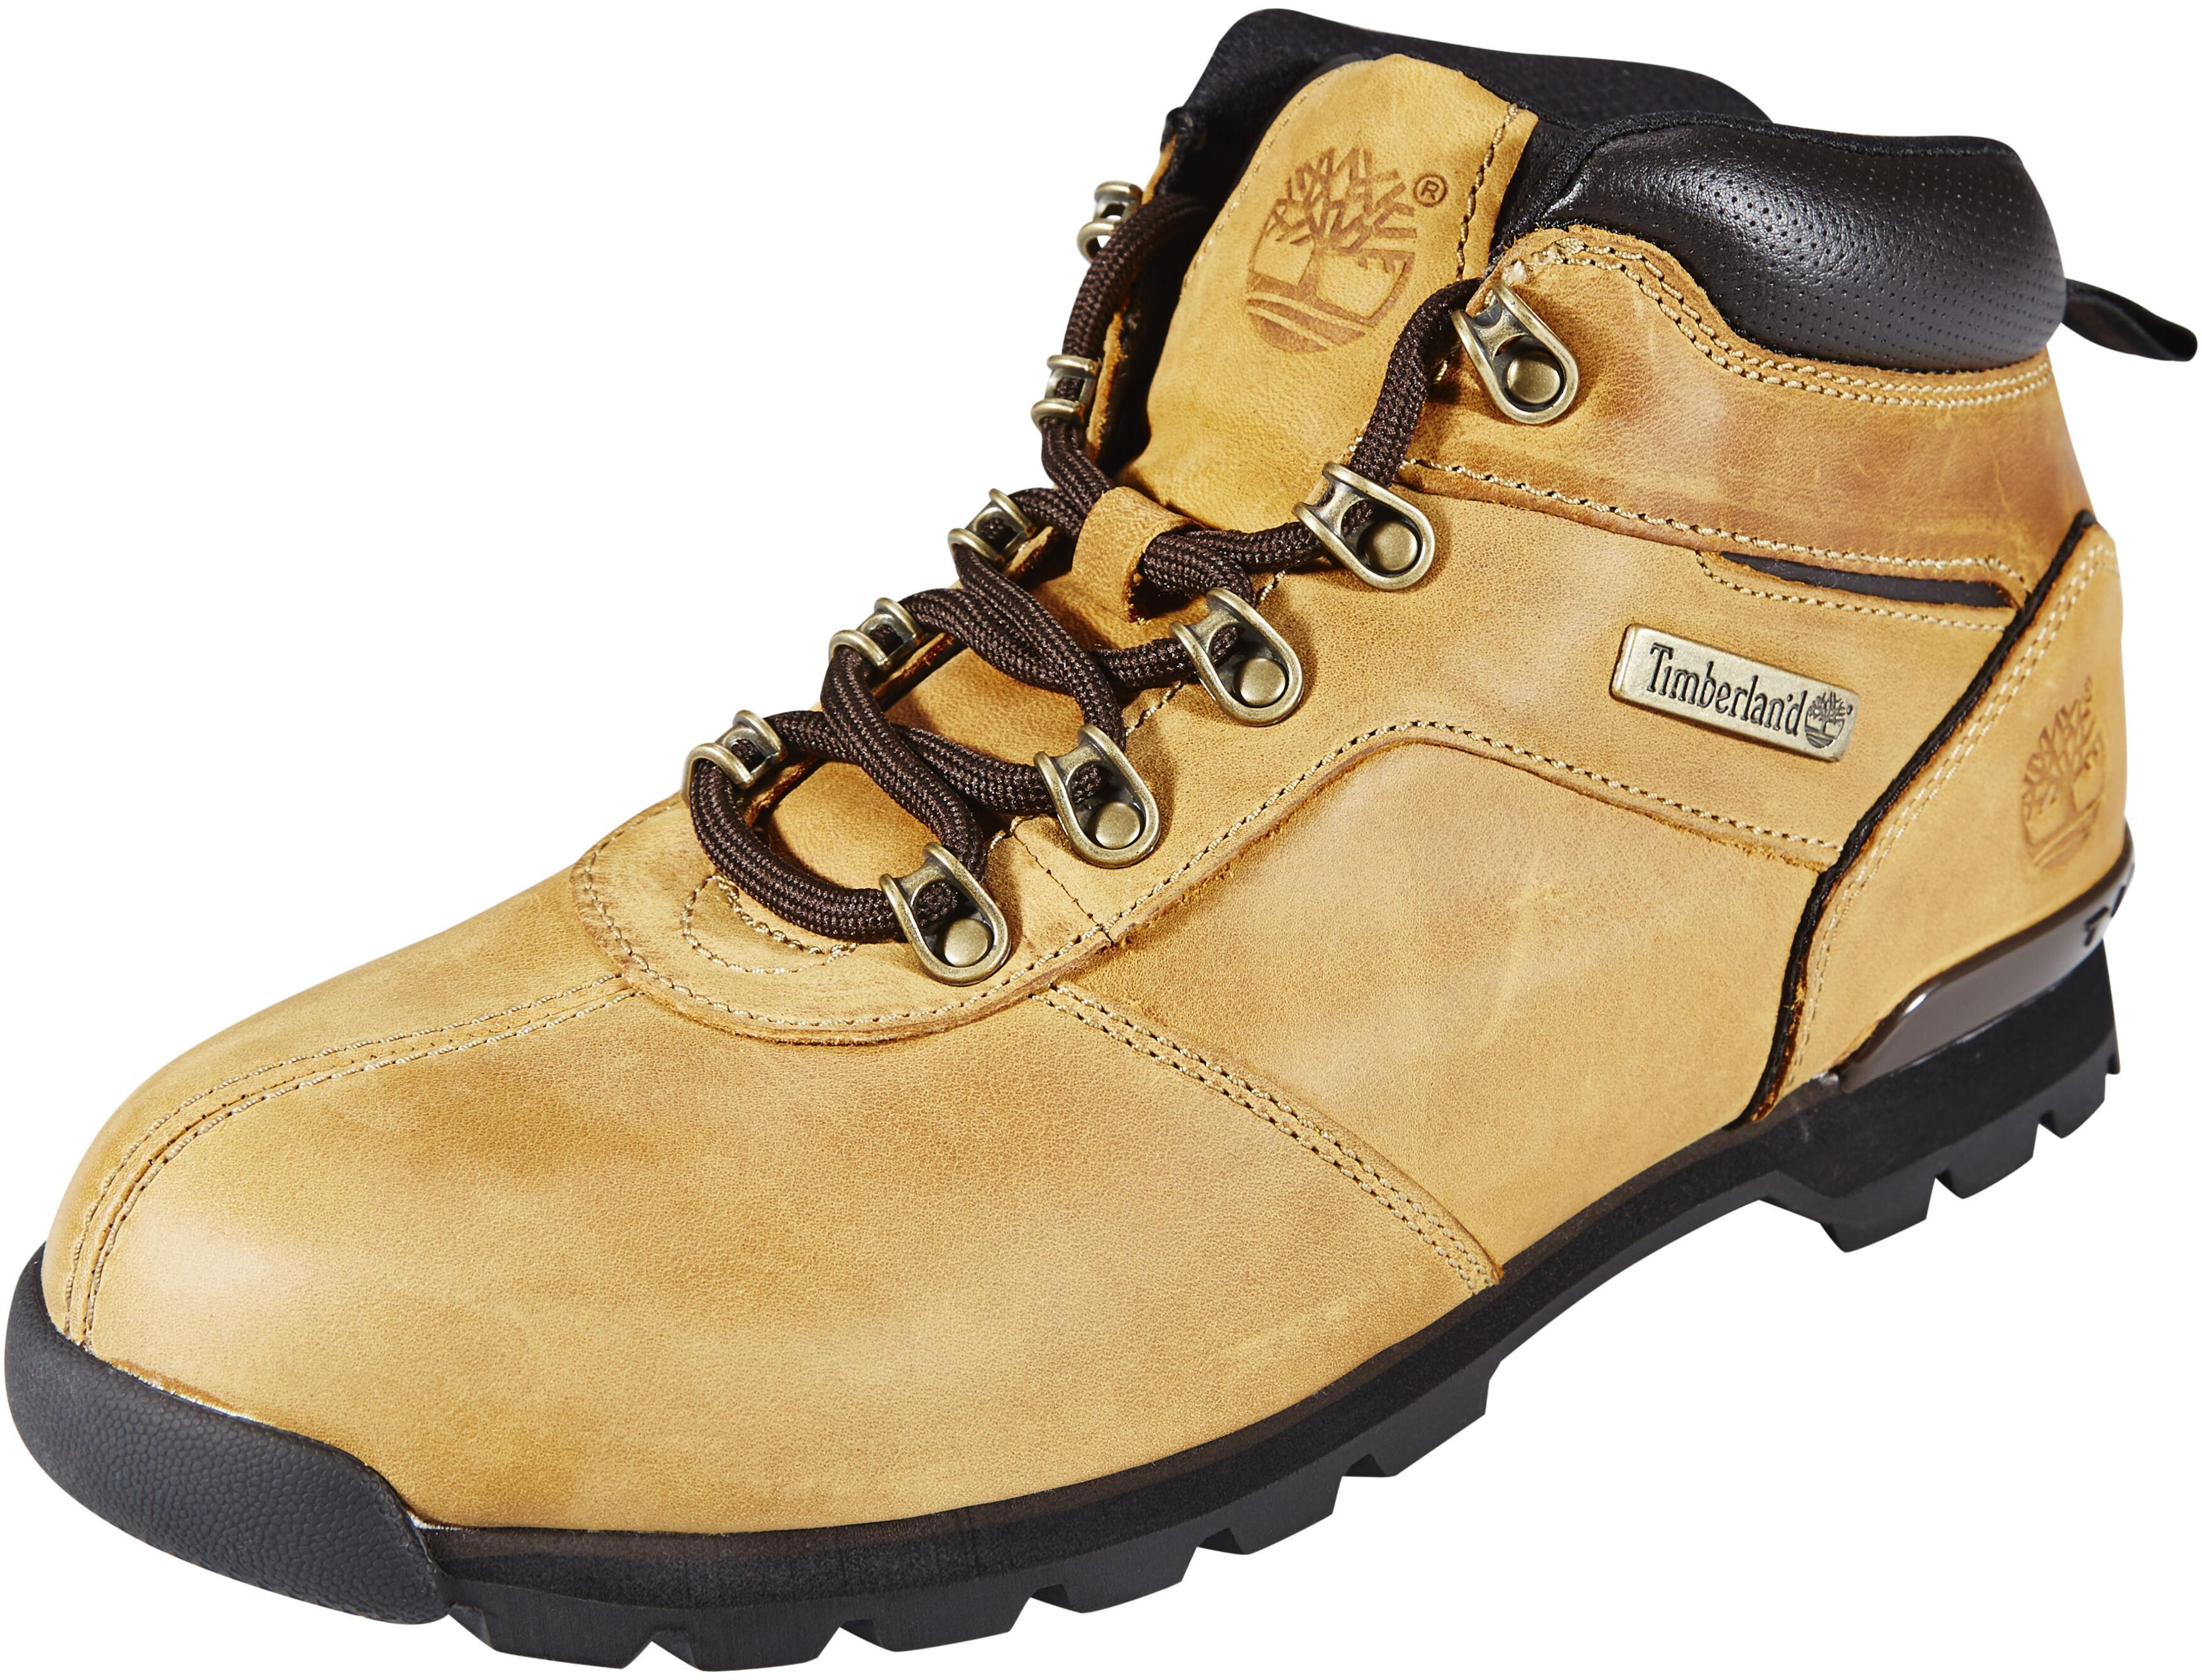 Timberland Splitrock 2 Miehet kengät  2adb39d069